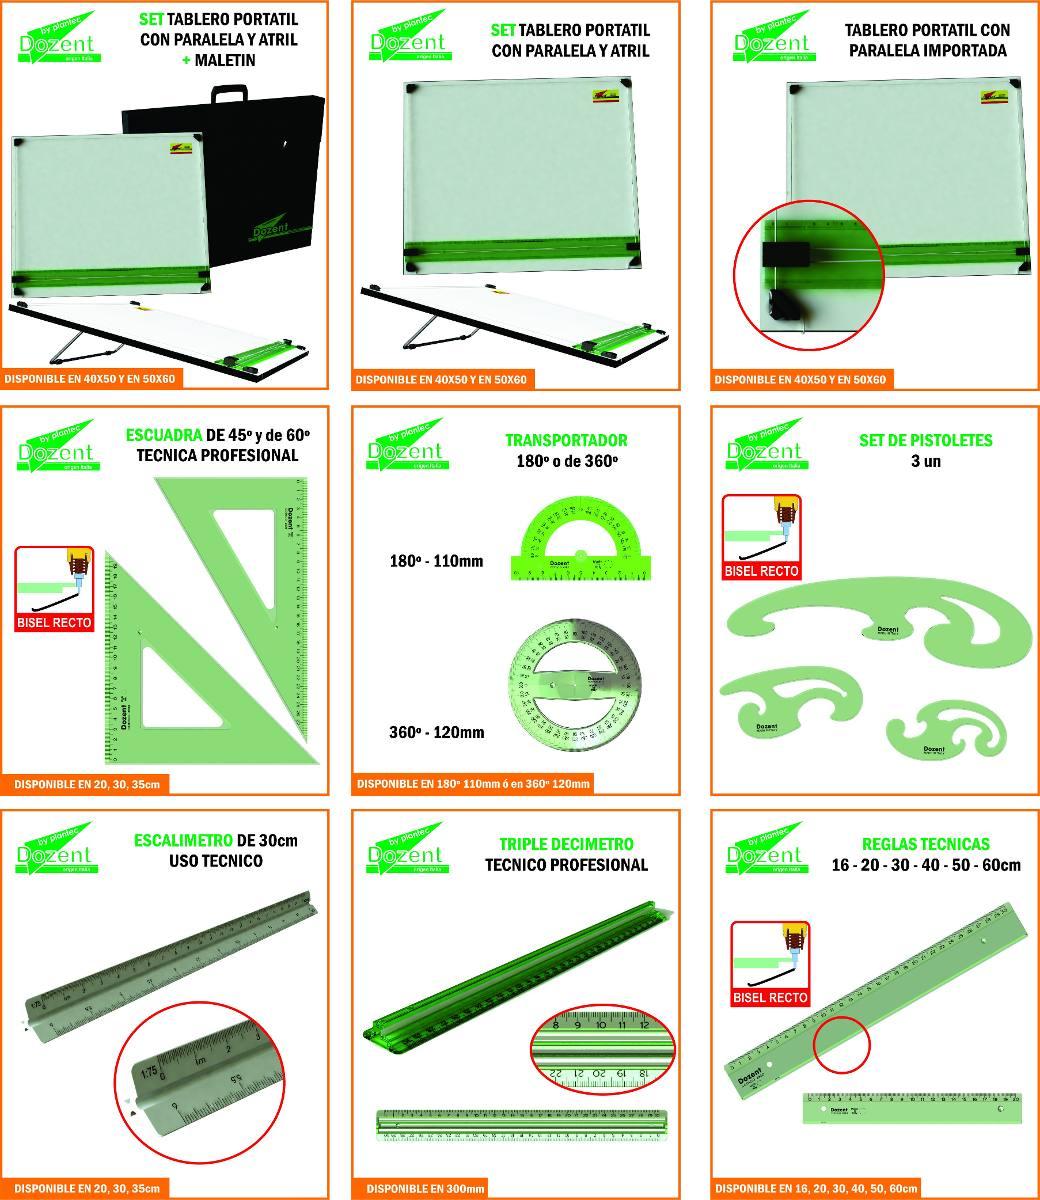 Märklin 72796 kit pon obra con obra especializada accesorio #neu en OVP #